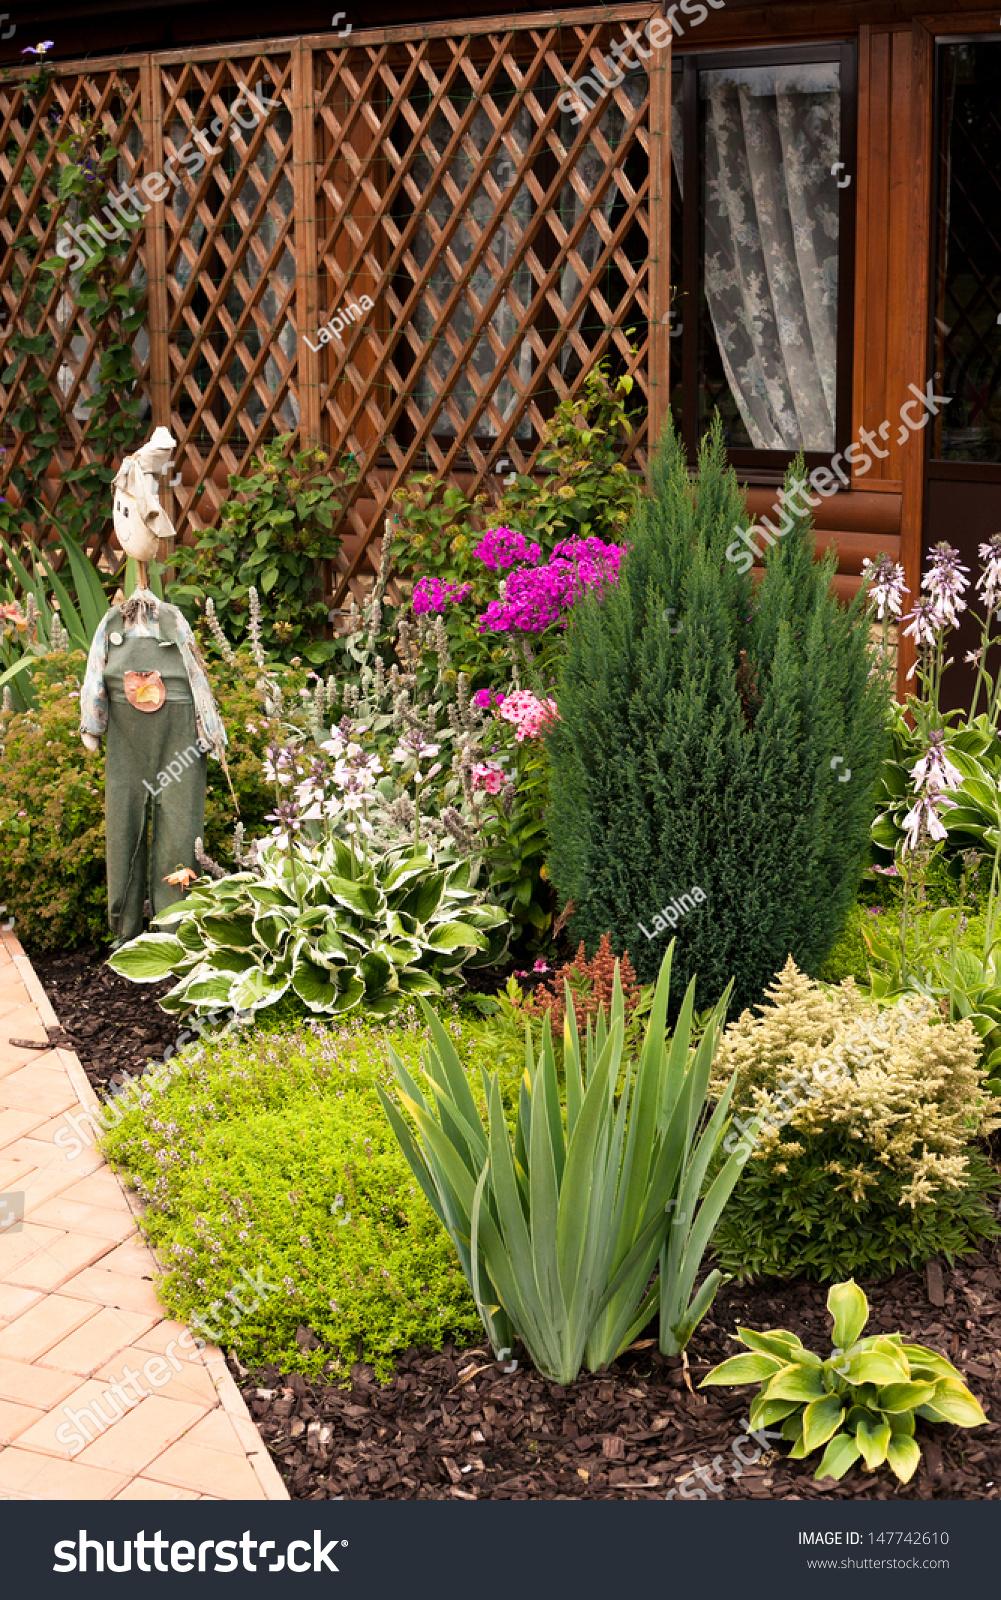 Beautiful garden flowers scare craw stock photo edit now 147742610 beautiful garden with flowers and scare craw izmirmasajfo